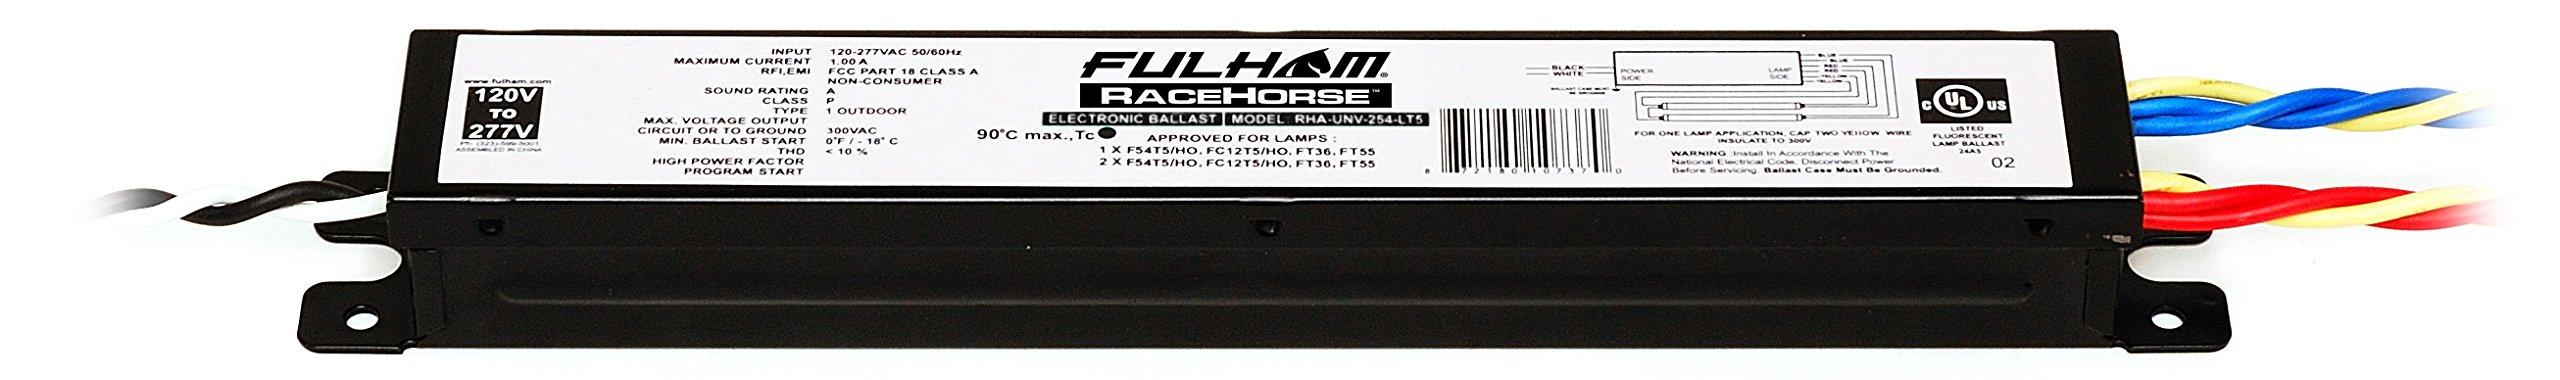 Fulham Lighting Fulham Racehorse Linear Ballast for T5HO, RHA-UNV-254-LT5